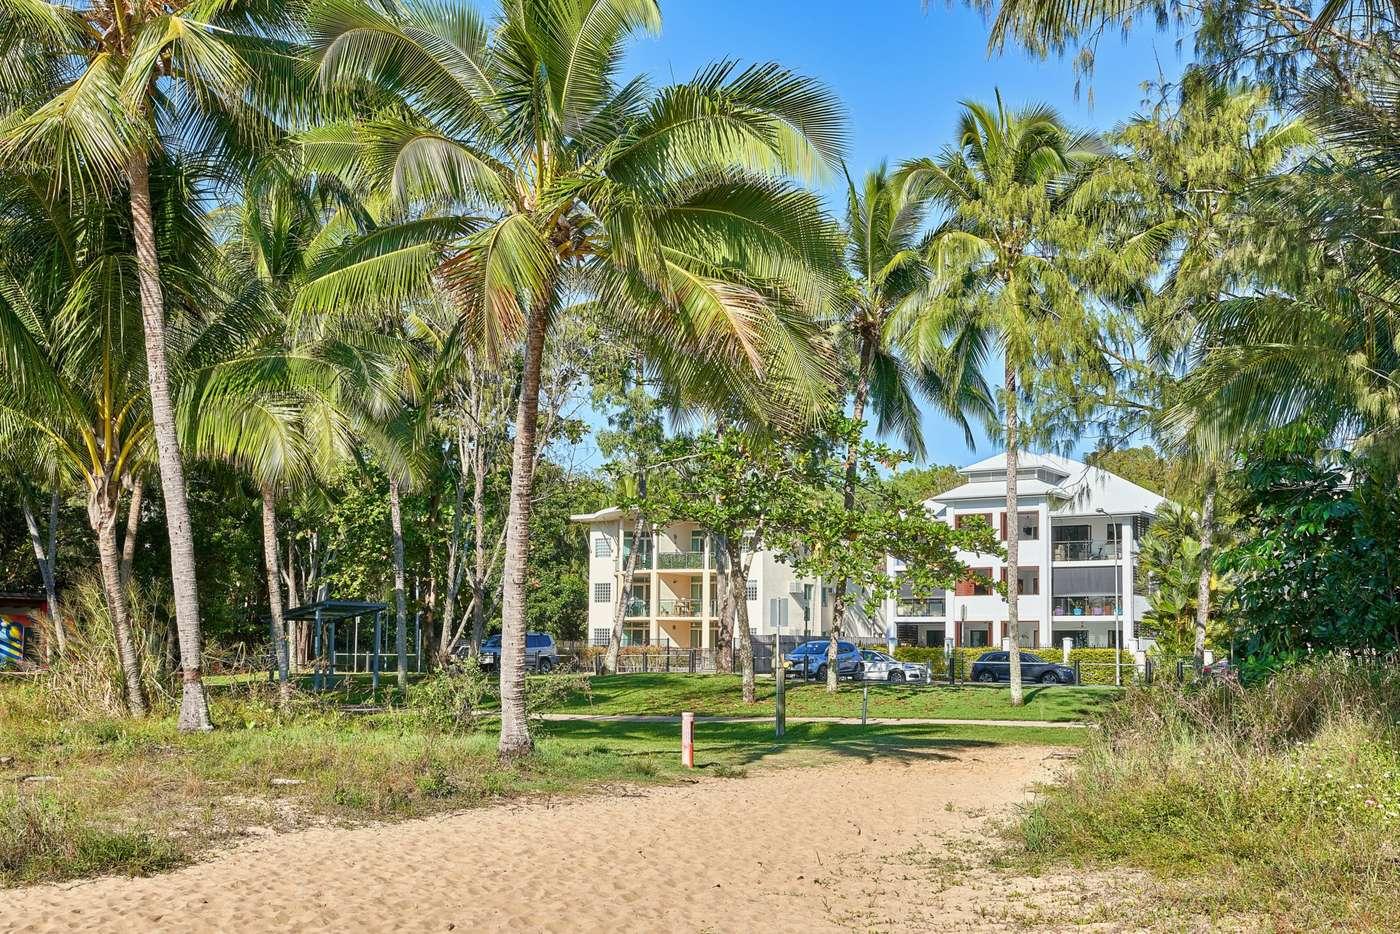 Main view of Homely apartment listing, 5/27 Sims Esplanade, Yorkeys Knob QLD 4878